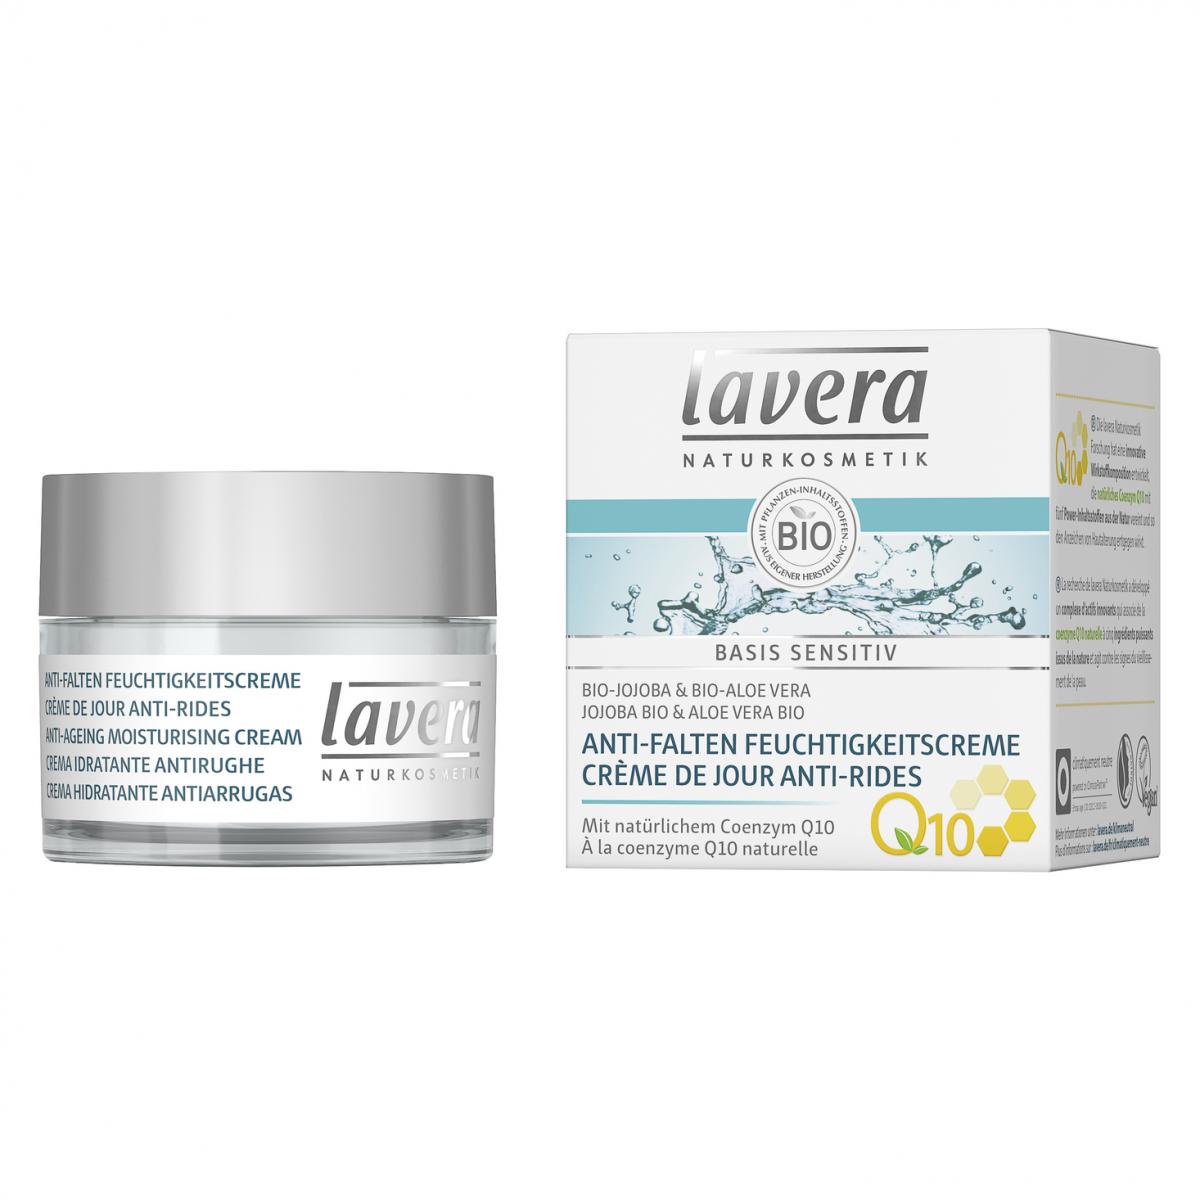 Anti-Falten Feuchtigkeitscreme Q10 basis sensitiv Tiegel 50 ml - Lavera